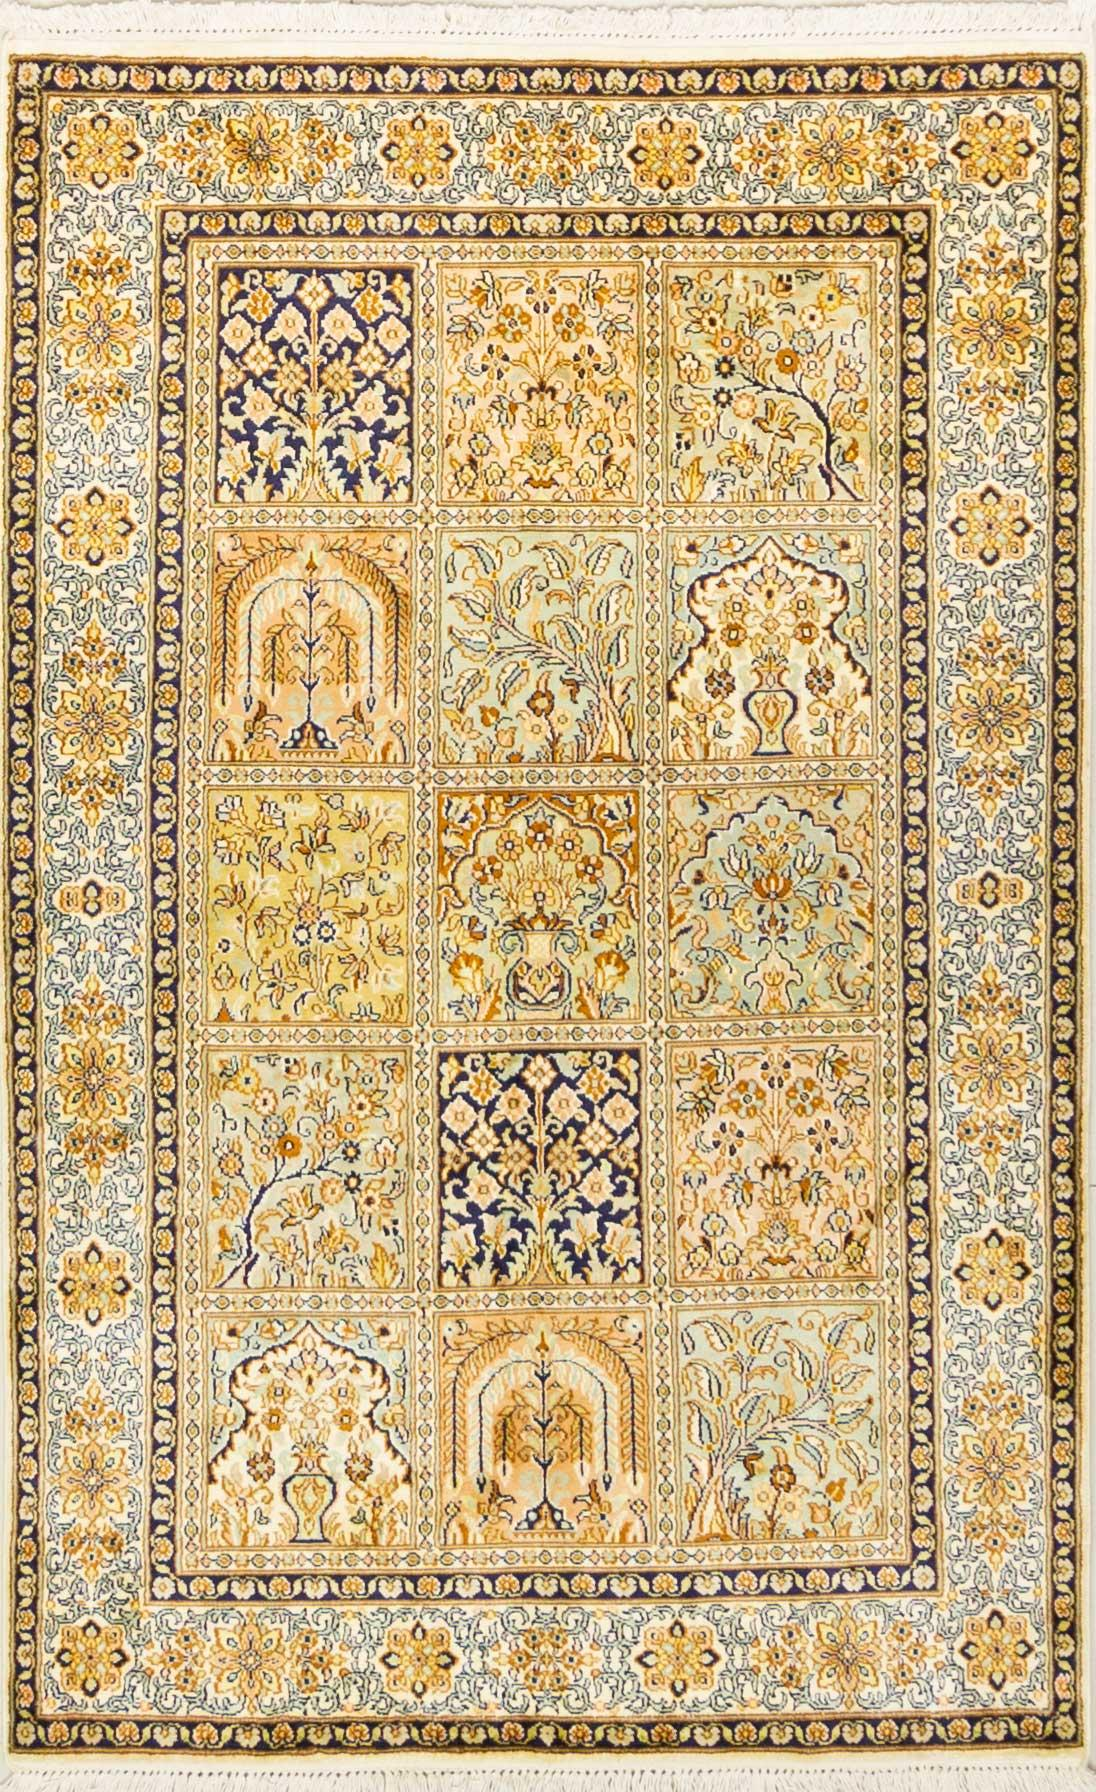 A Hand Knotted Silk Keshmiri Rug, 152 x 97